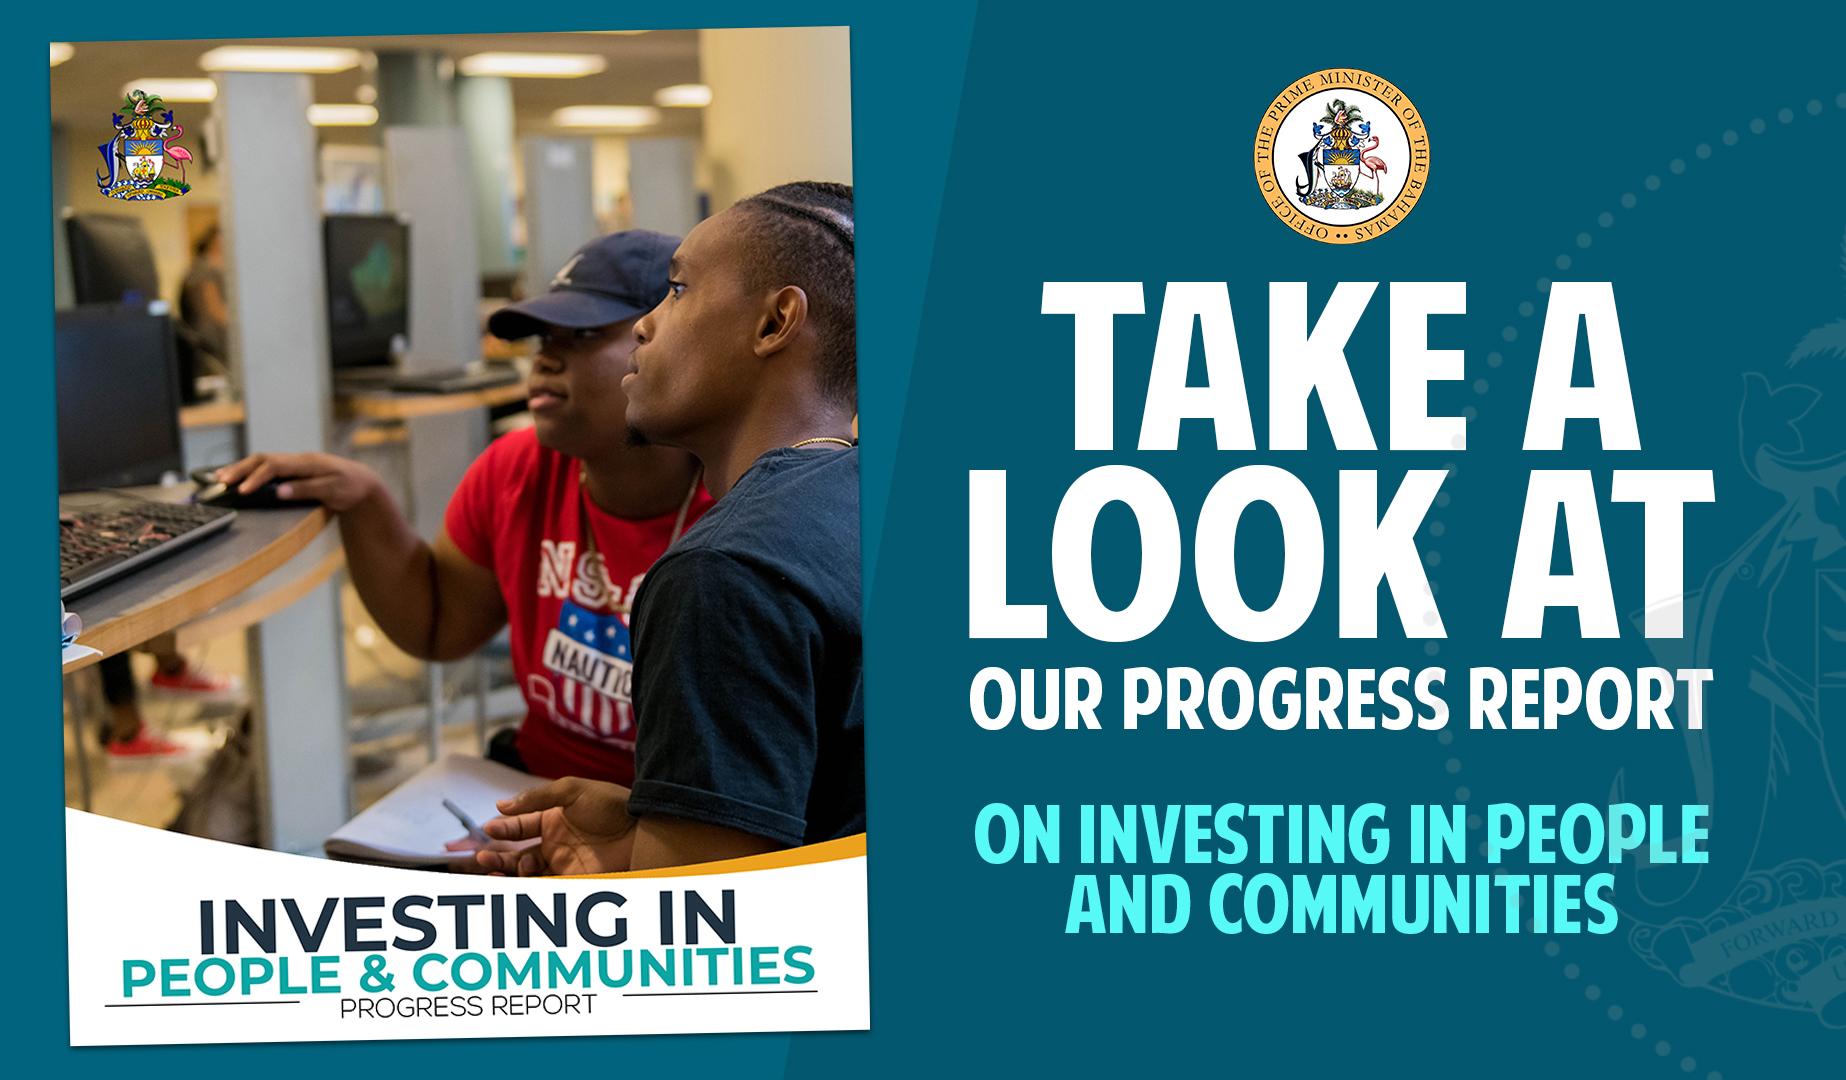 Government Progress Report highlights accomplishments